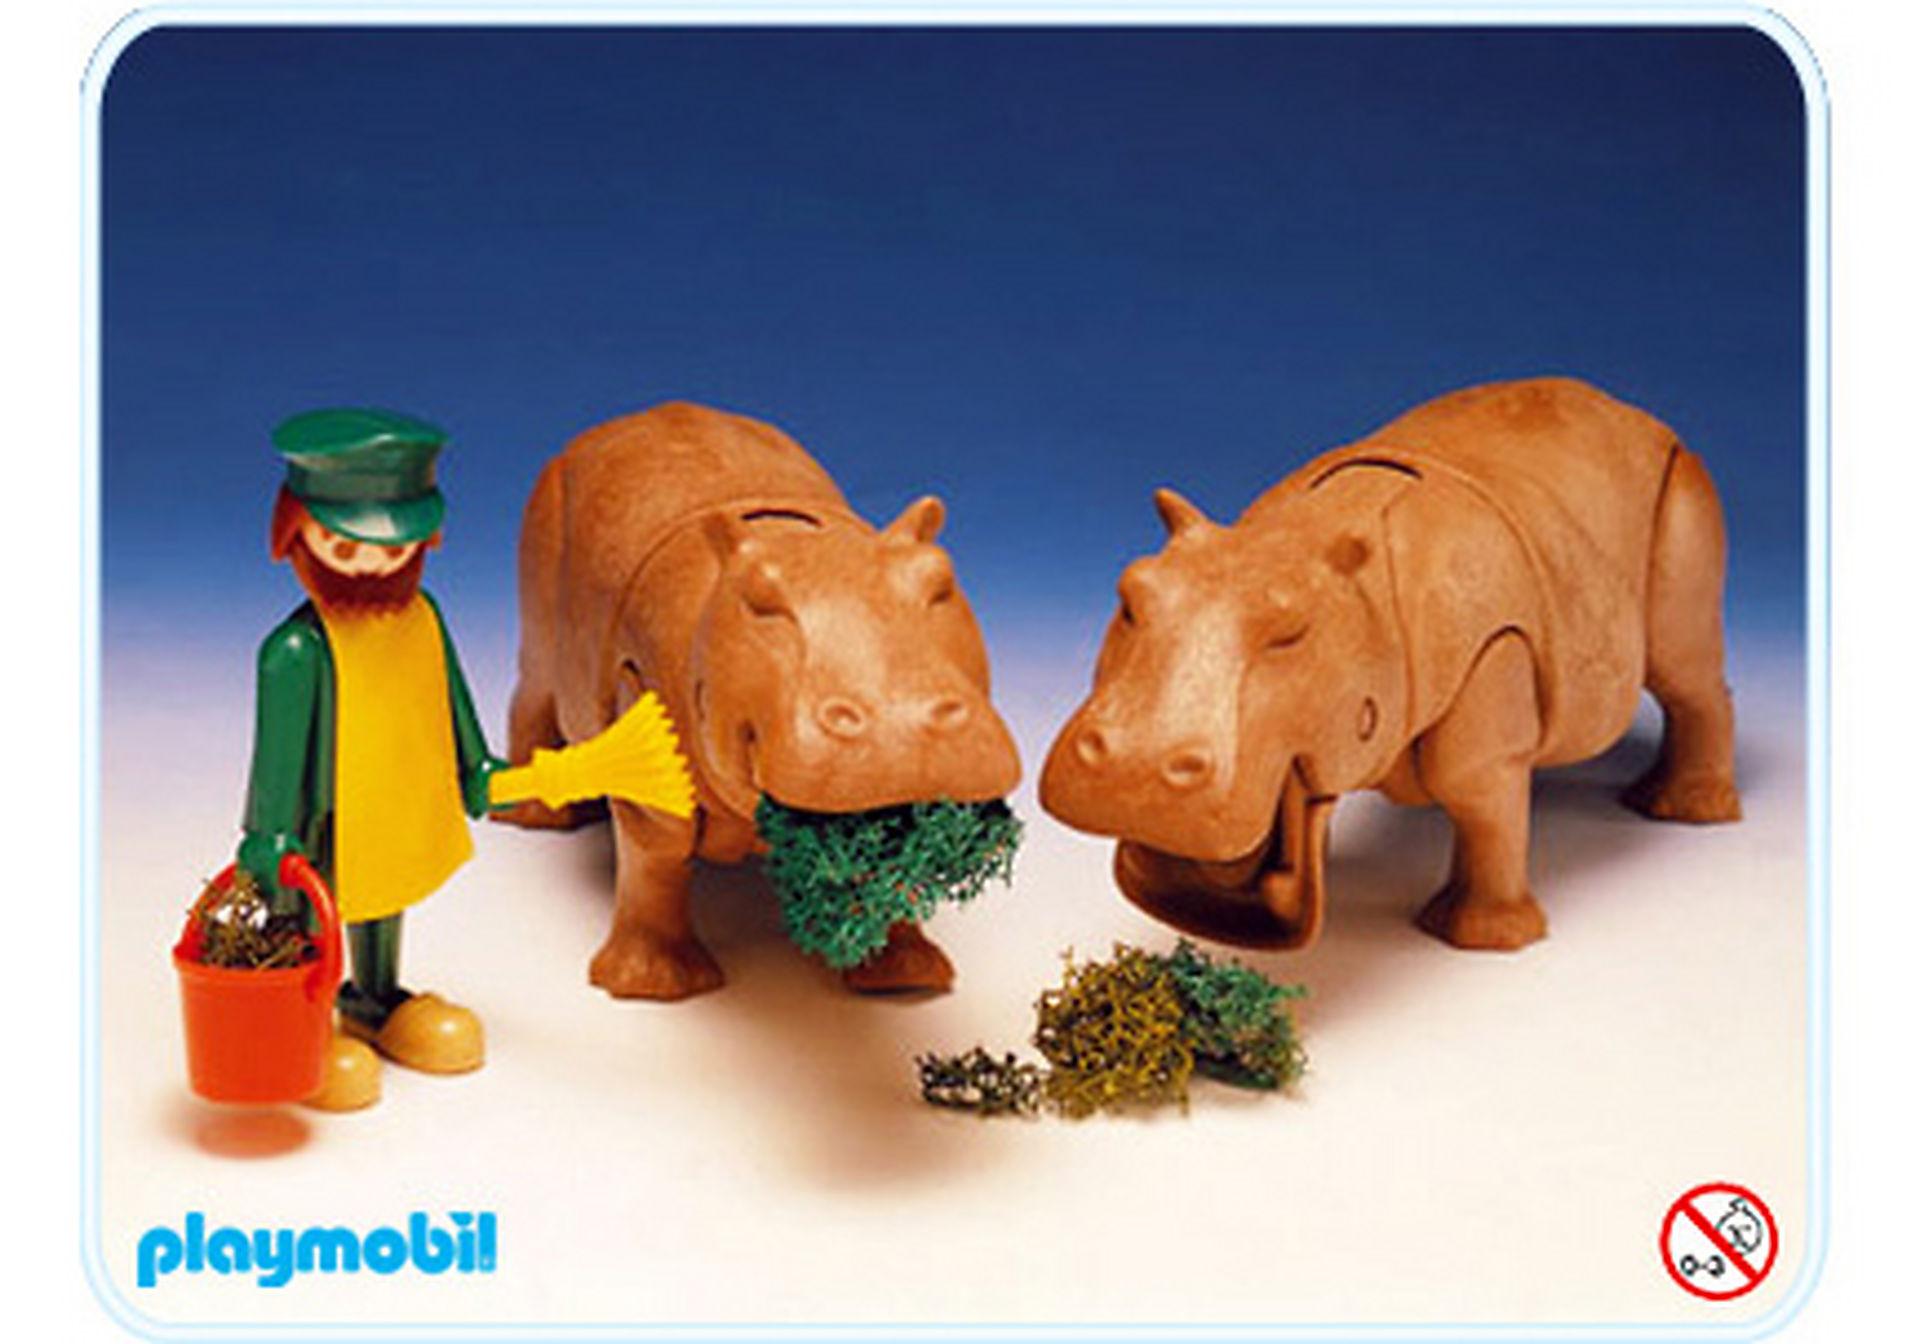 http://media.playmobil.com/i/playmobil/3547-A_product_detail/2 Flußpferde/Tierpfleger